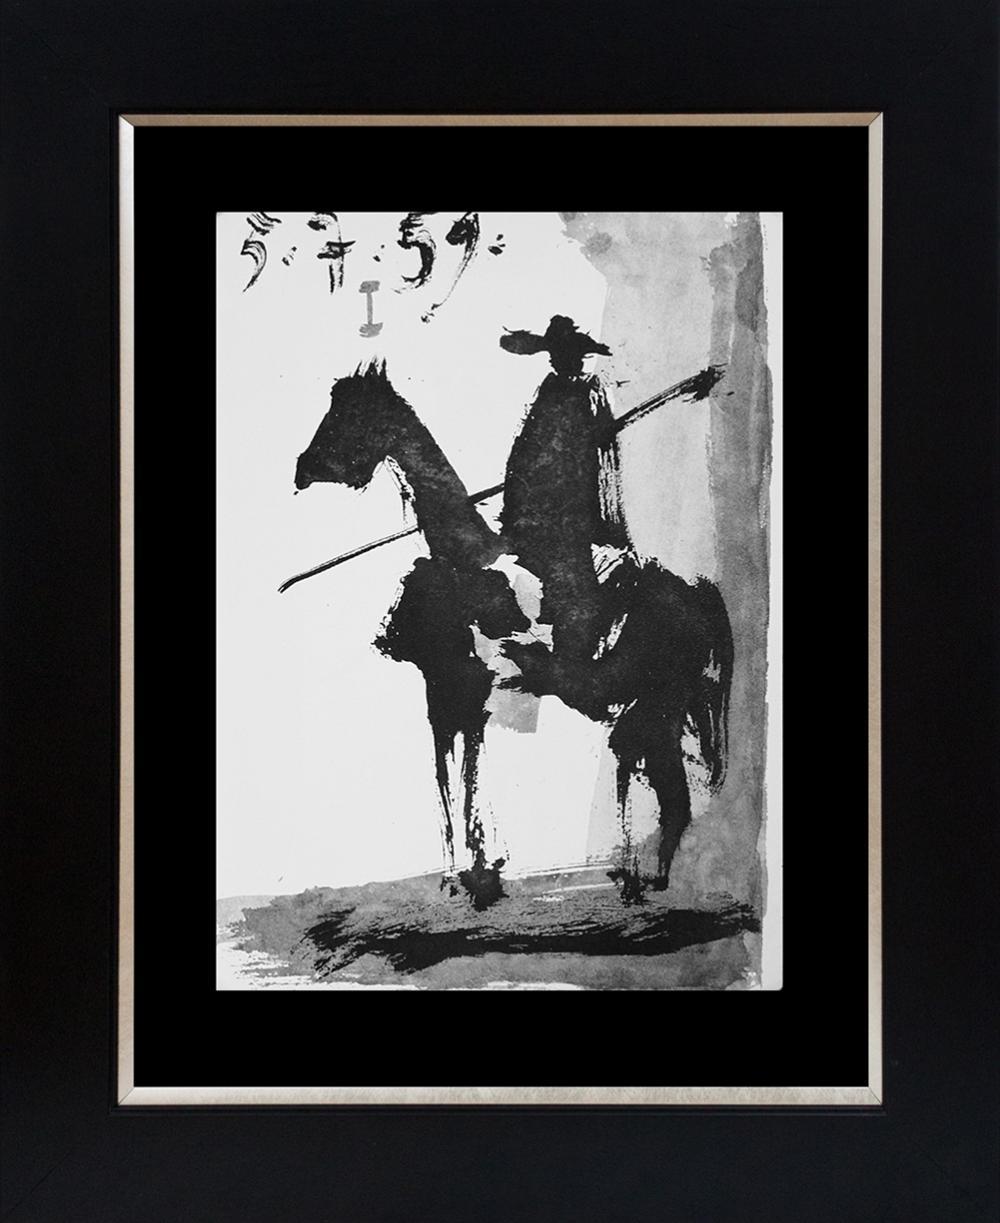 Lot 3385: Pablo Picasso 1961 Lithograph Toros Y Toreros.